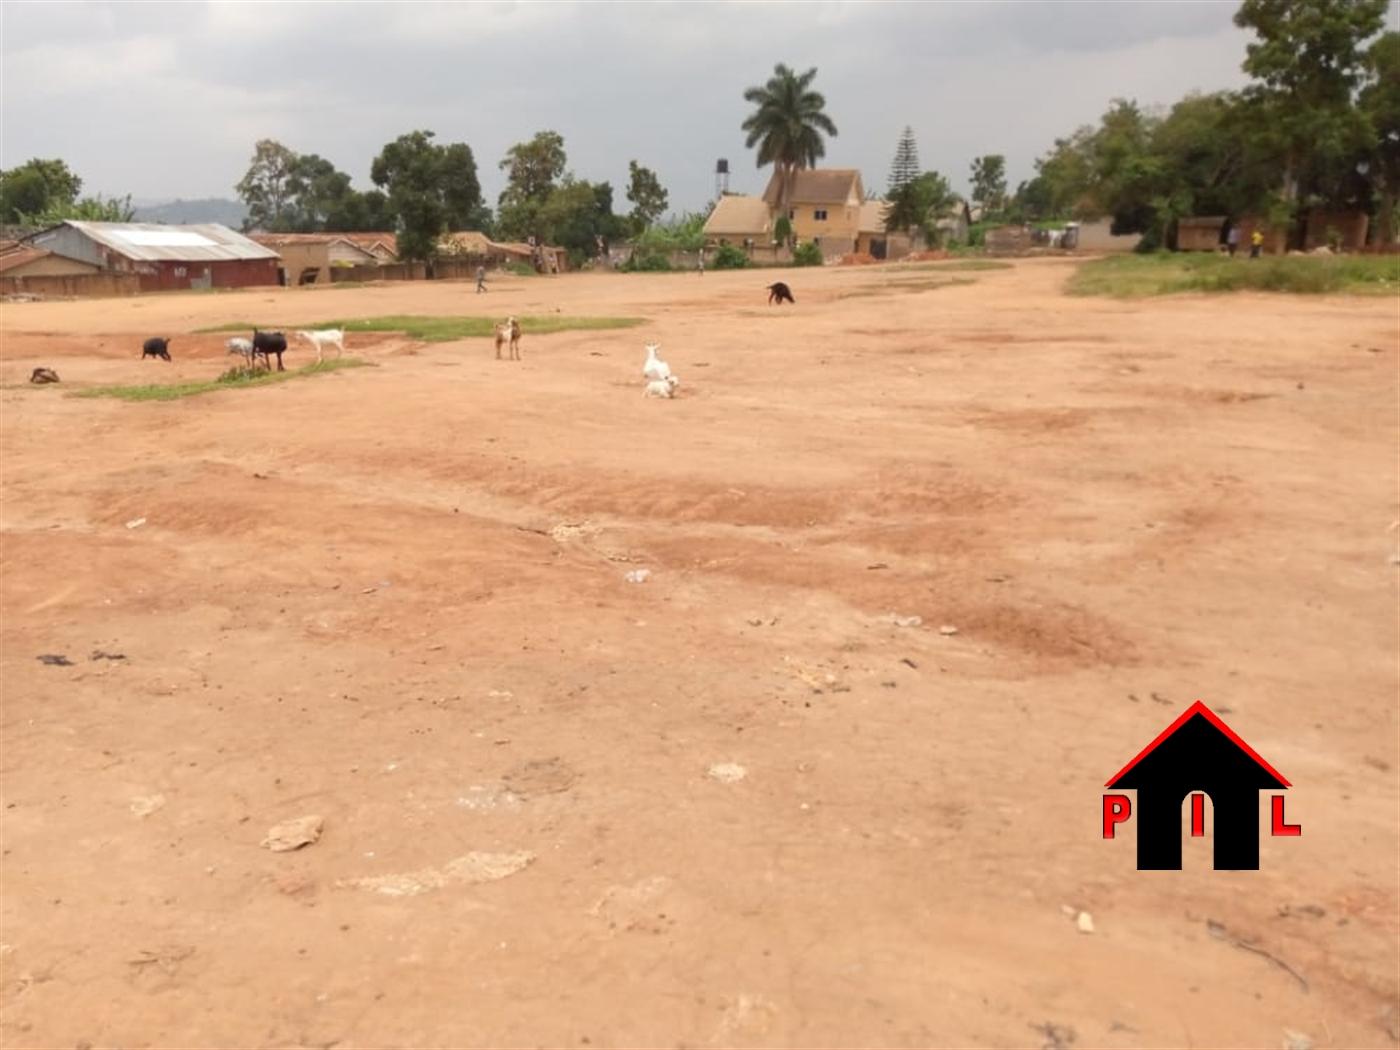 Commercial Land for sale in Kyadondo Kampala